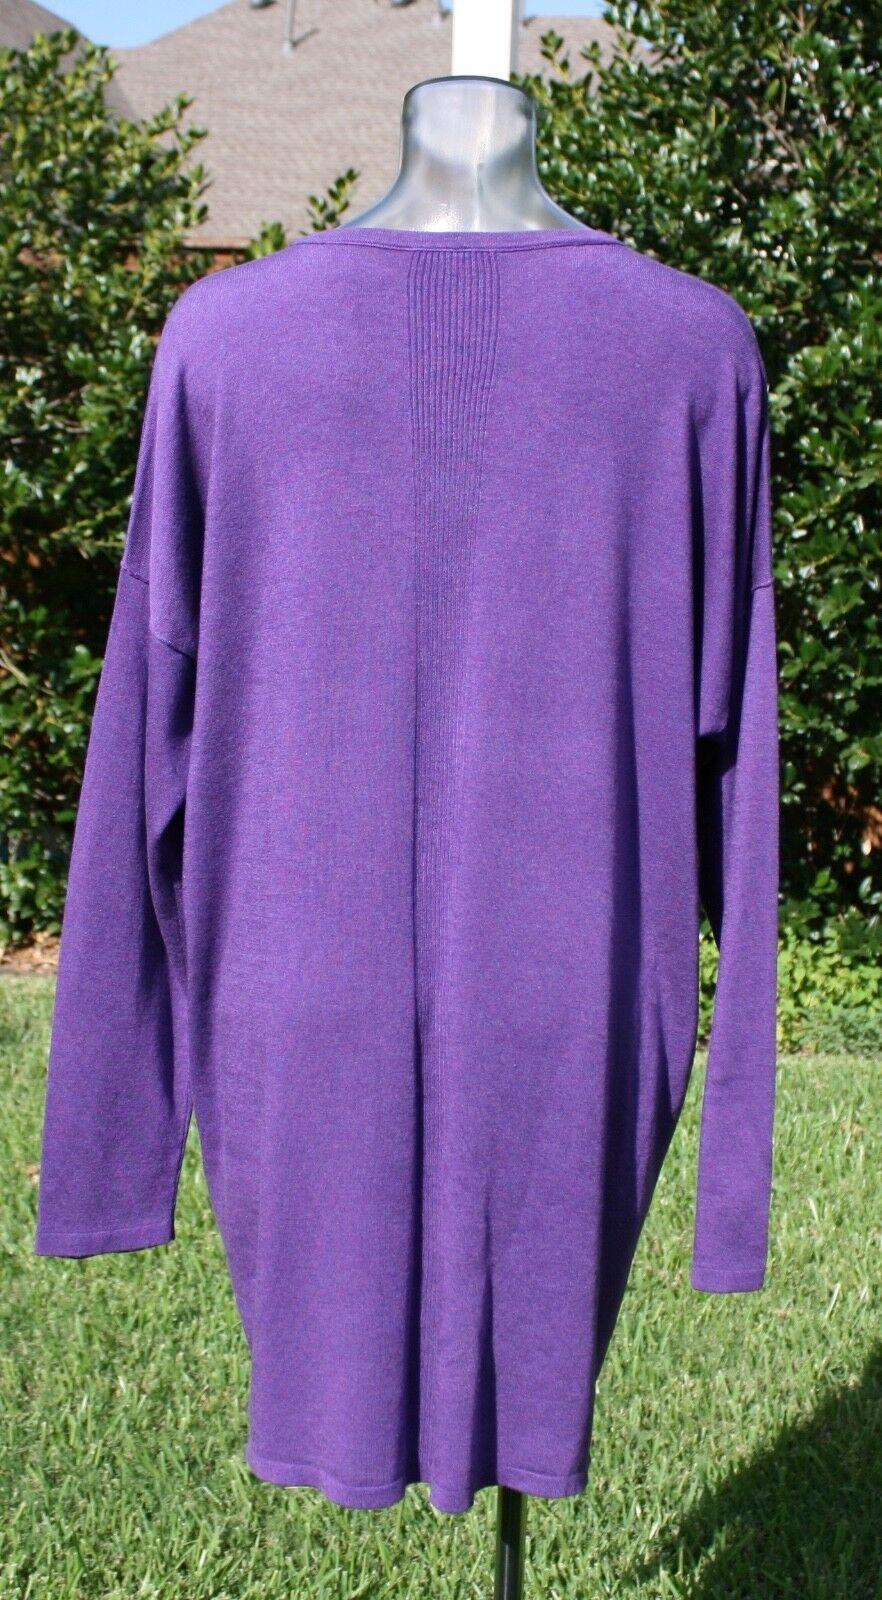 Eileen Fisher Lavender Lightweight VNeck Cardi NWT $158